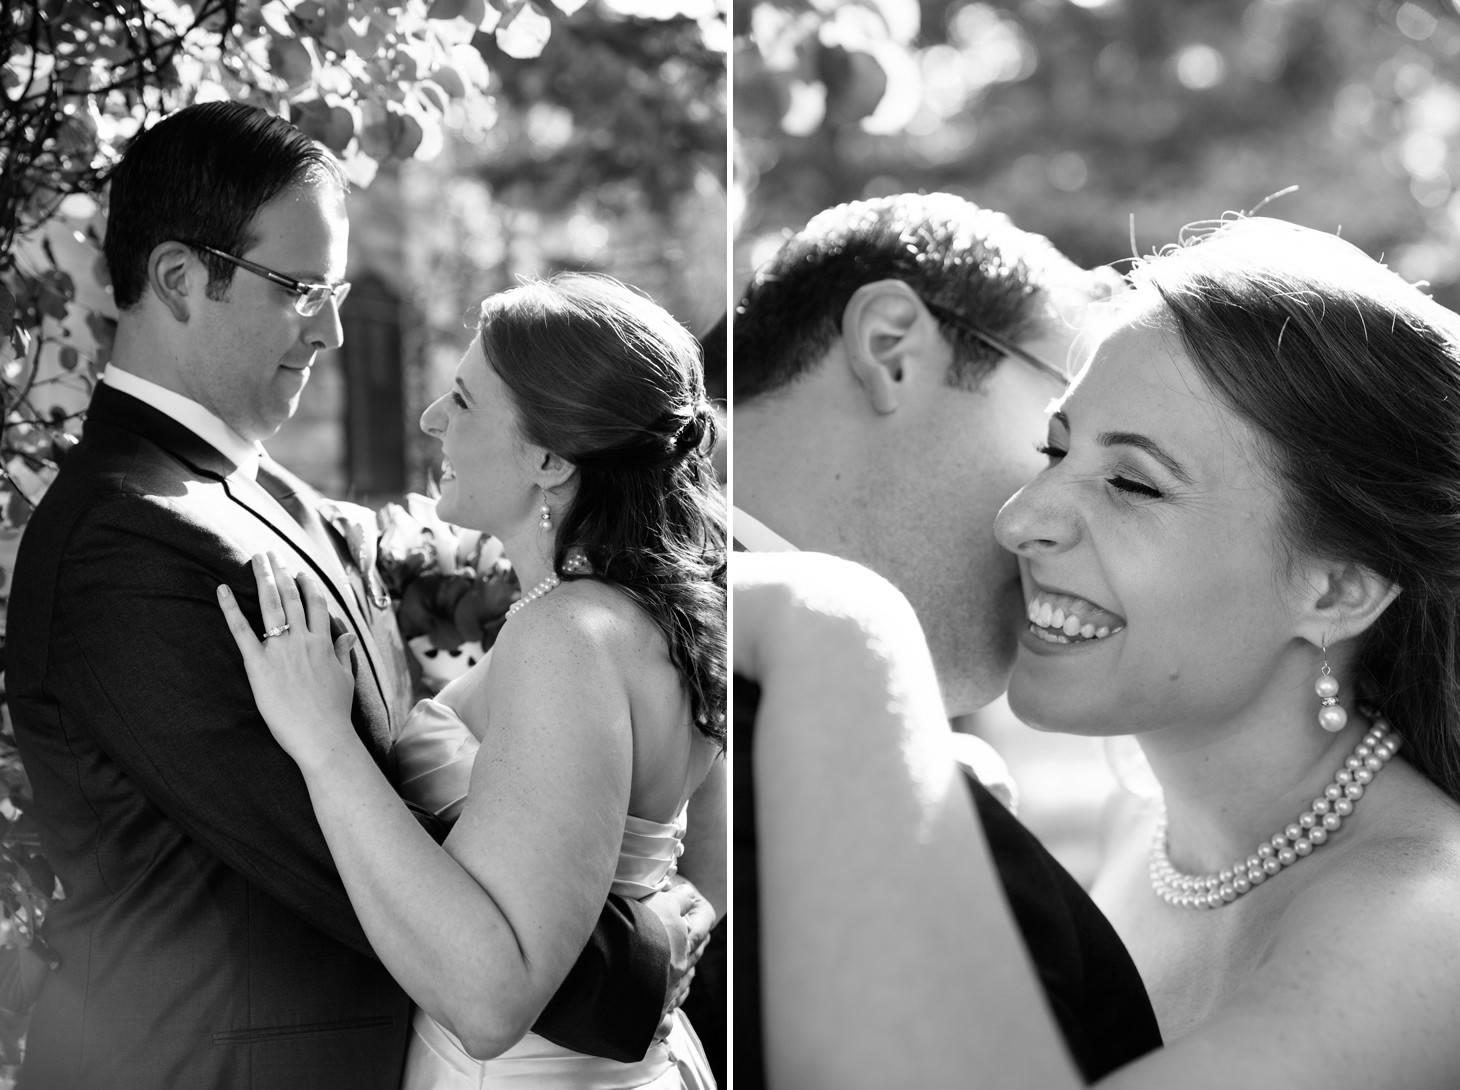 033-nyc-wedding-photographer-hoboken-waterfront-wedding-photos-smitten-chickens.jpg